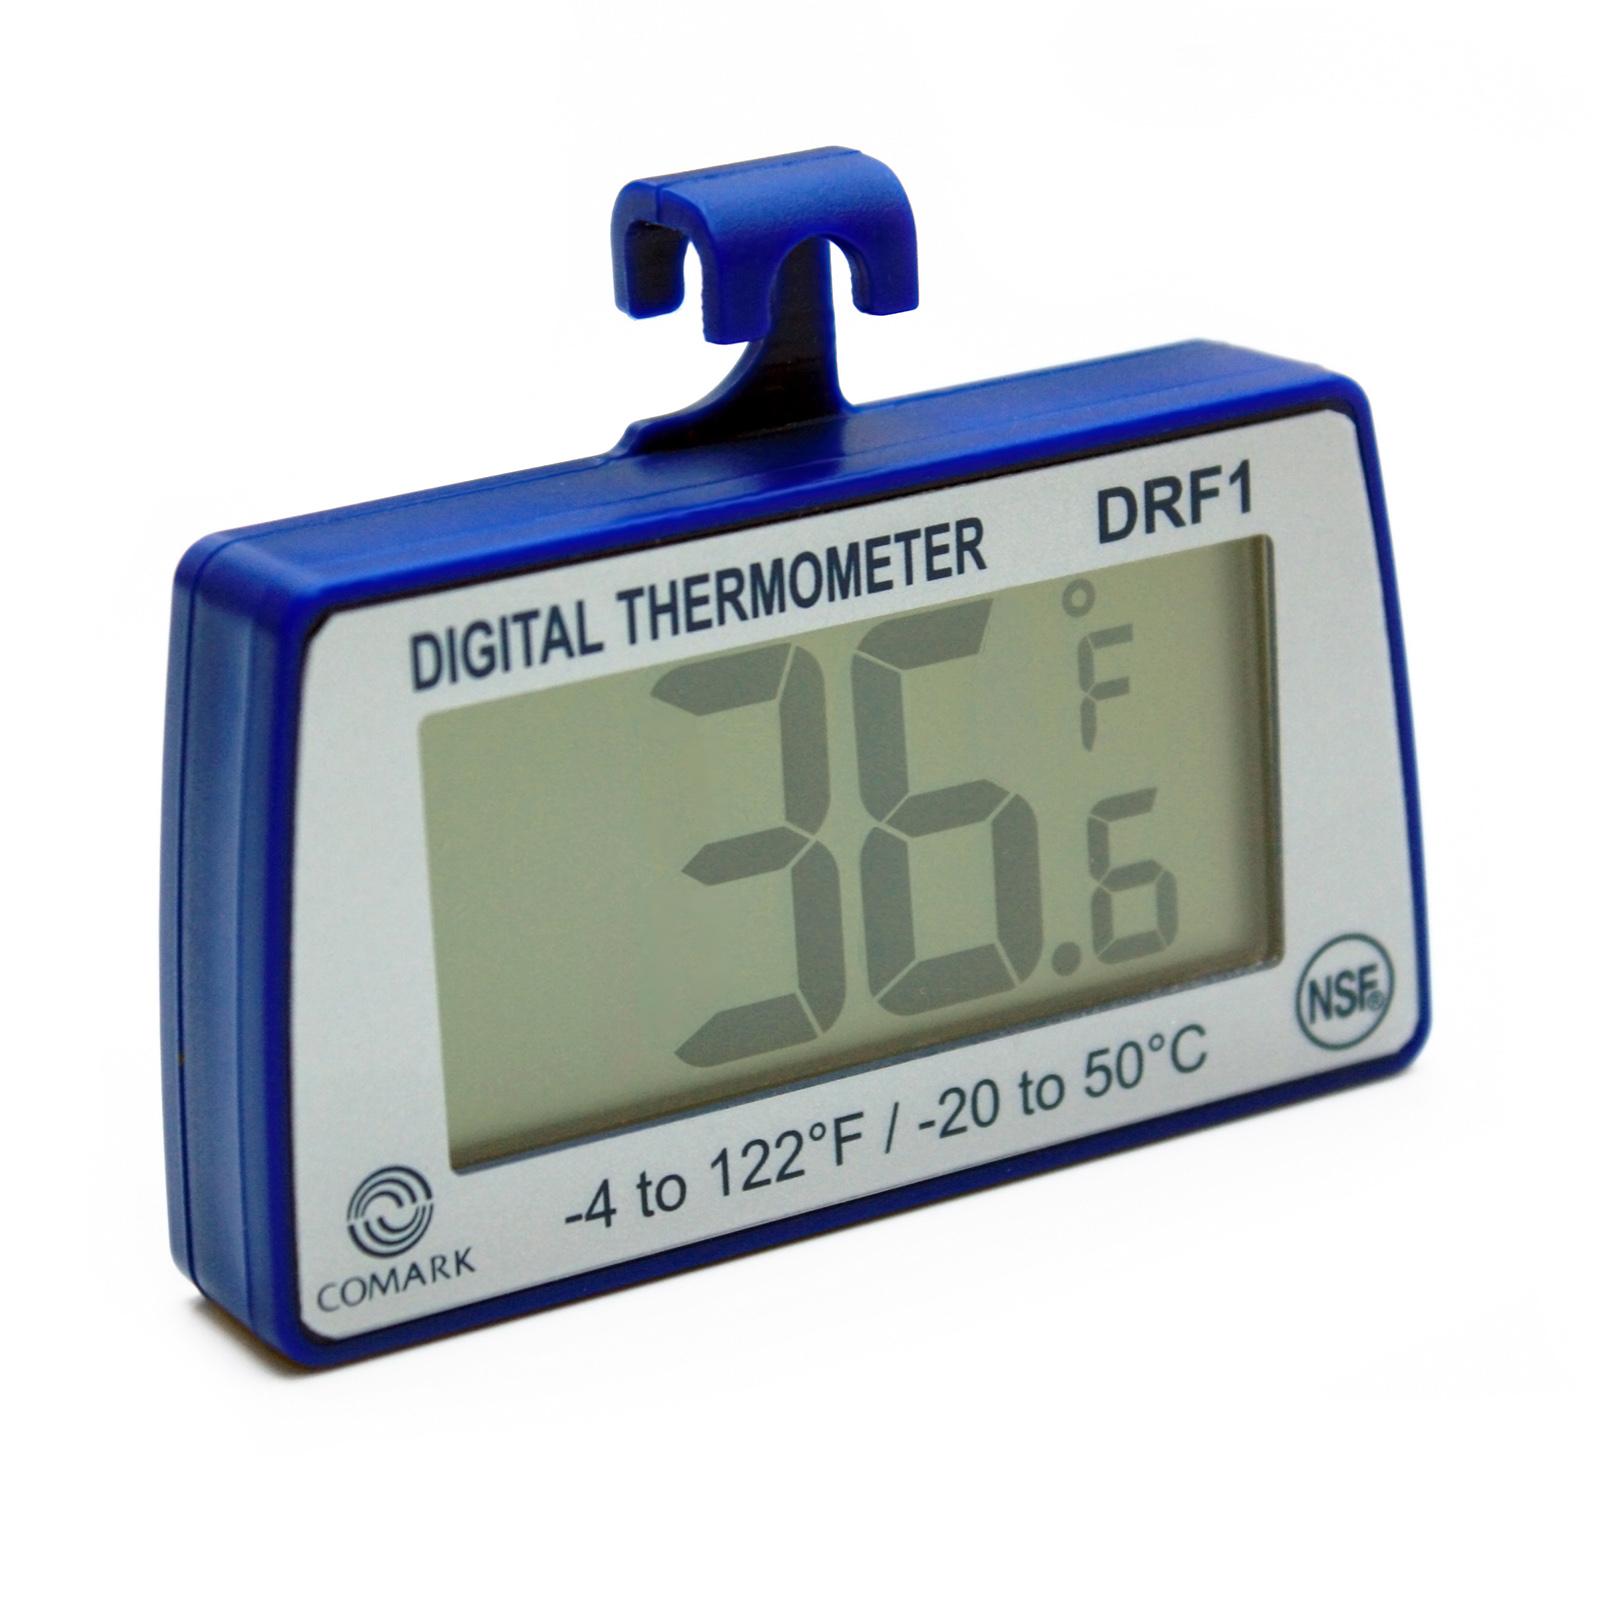 Comark Instruments (Fluke) DRF1 thermometer, refrig freezer